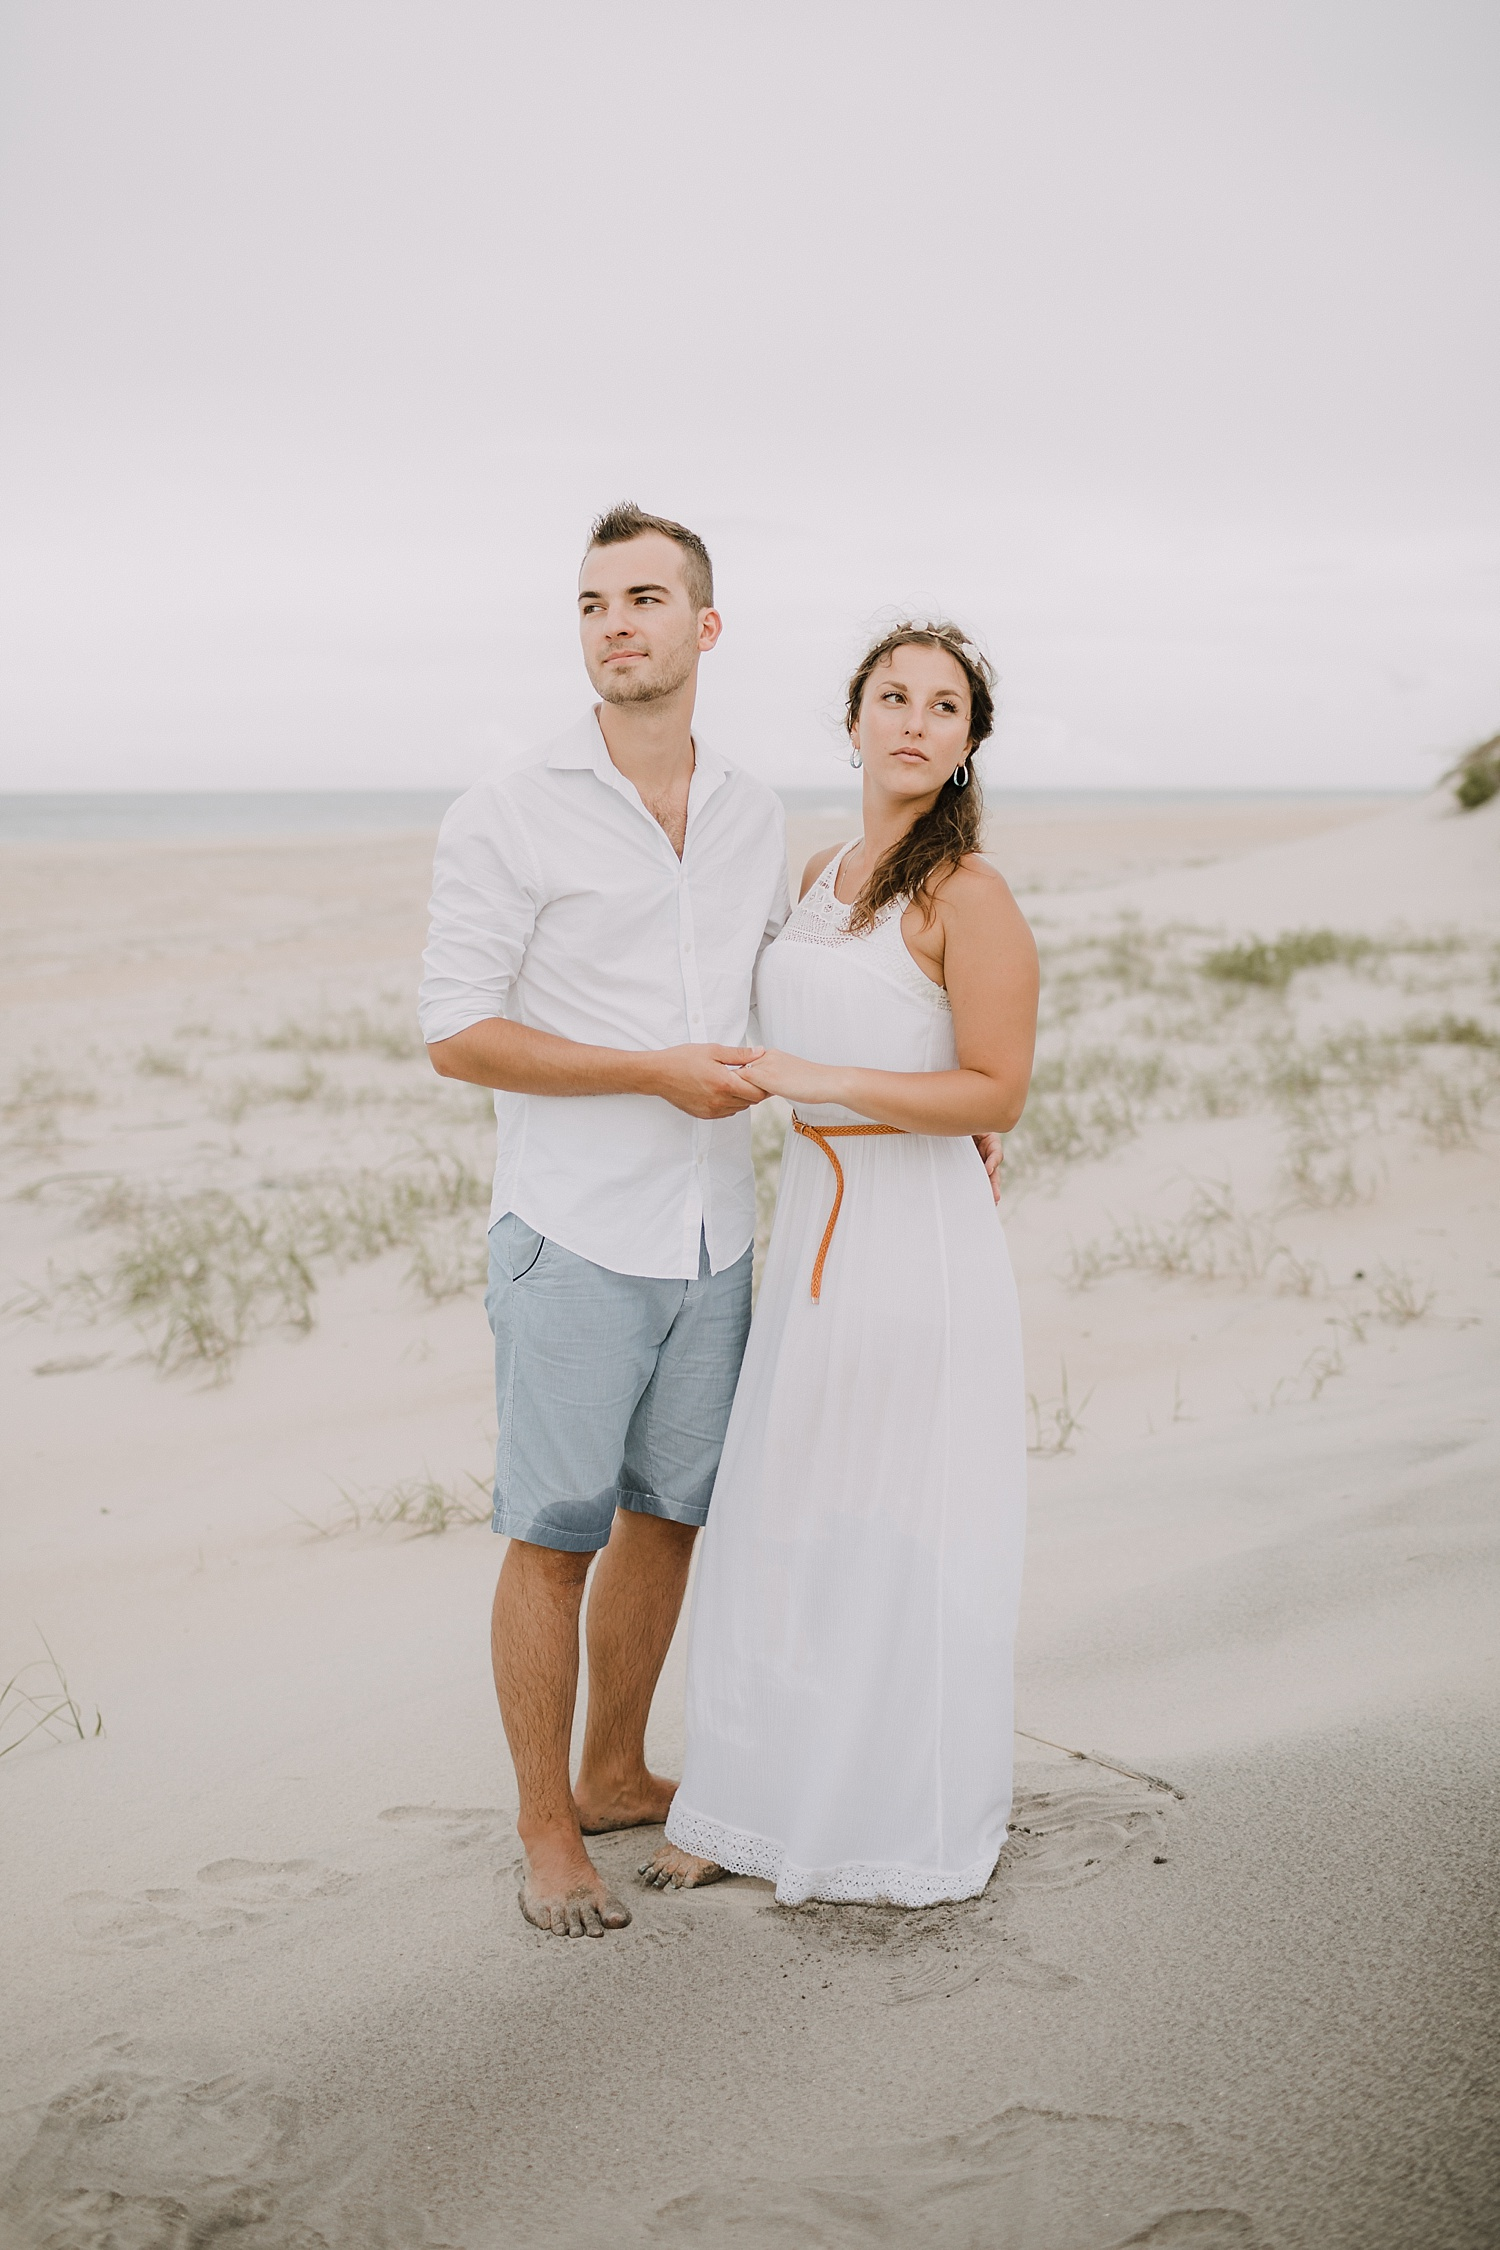 Rodanthe Outer Banks North Carolina NC surprise proposal engagement beach photographer session